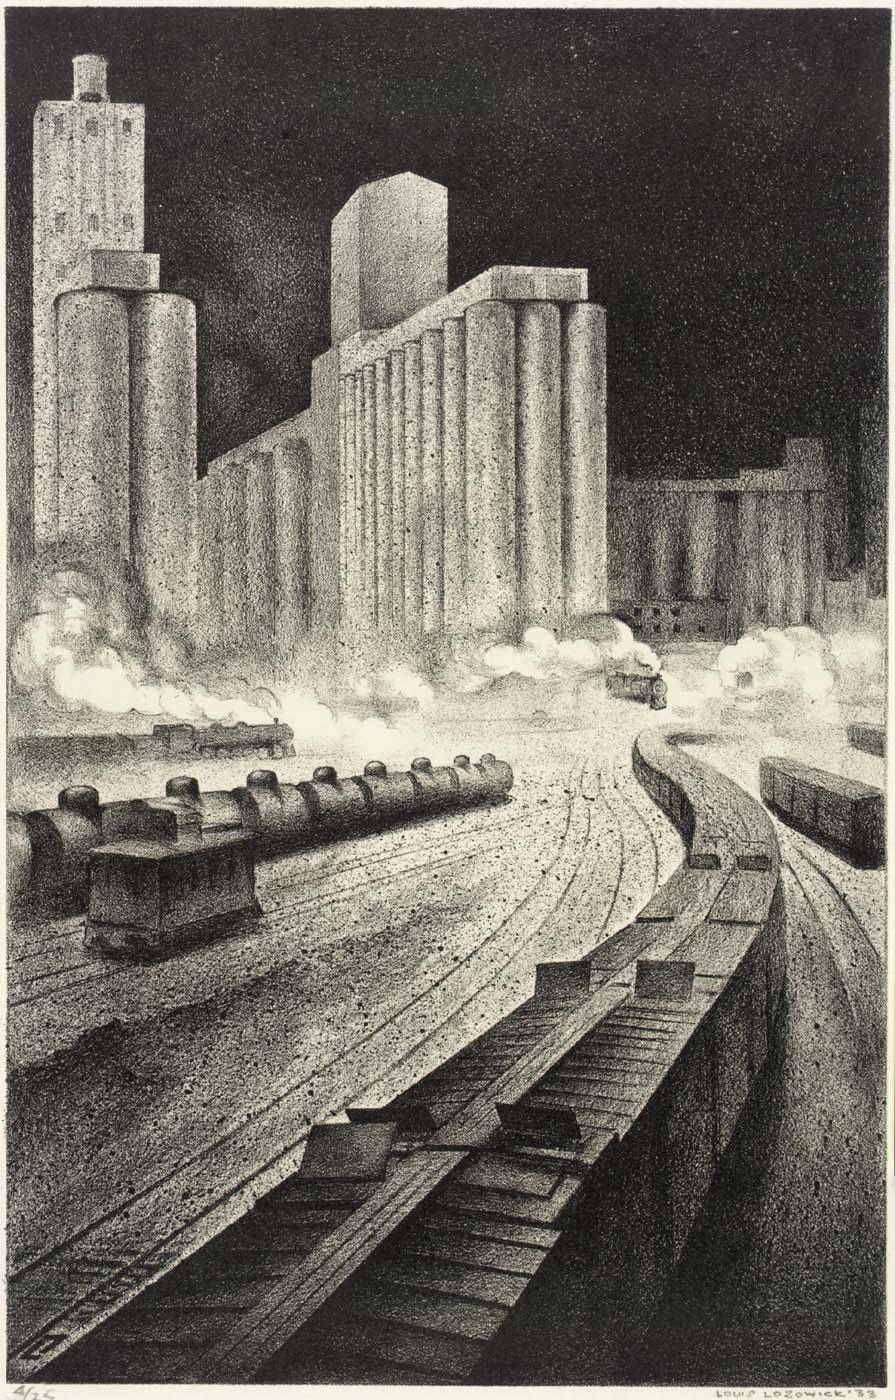 Louis Lozowick, Granaries to Babylon (1933)